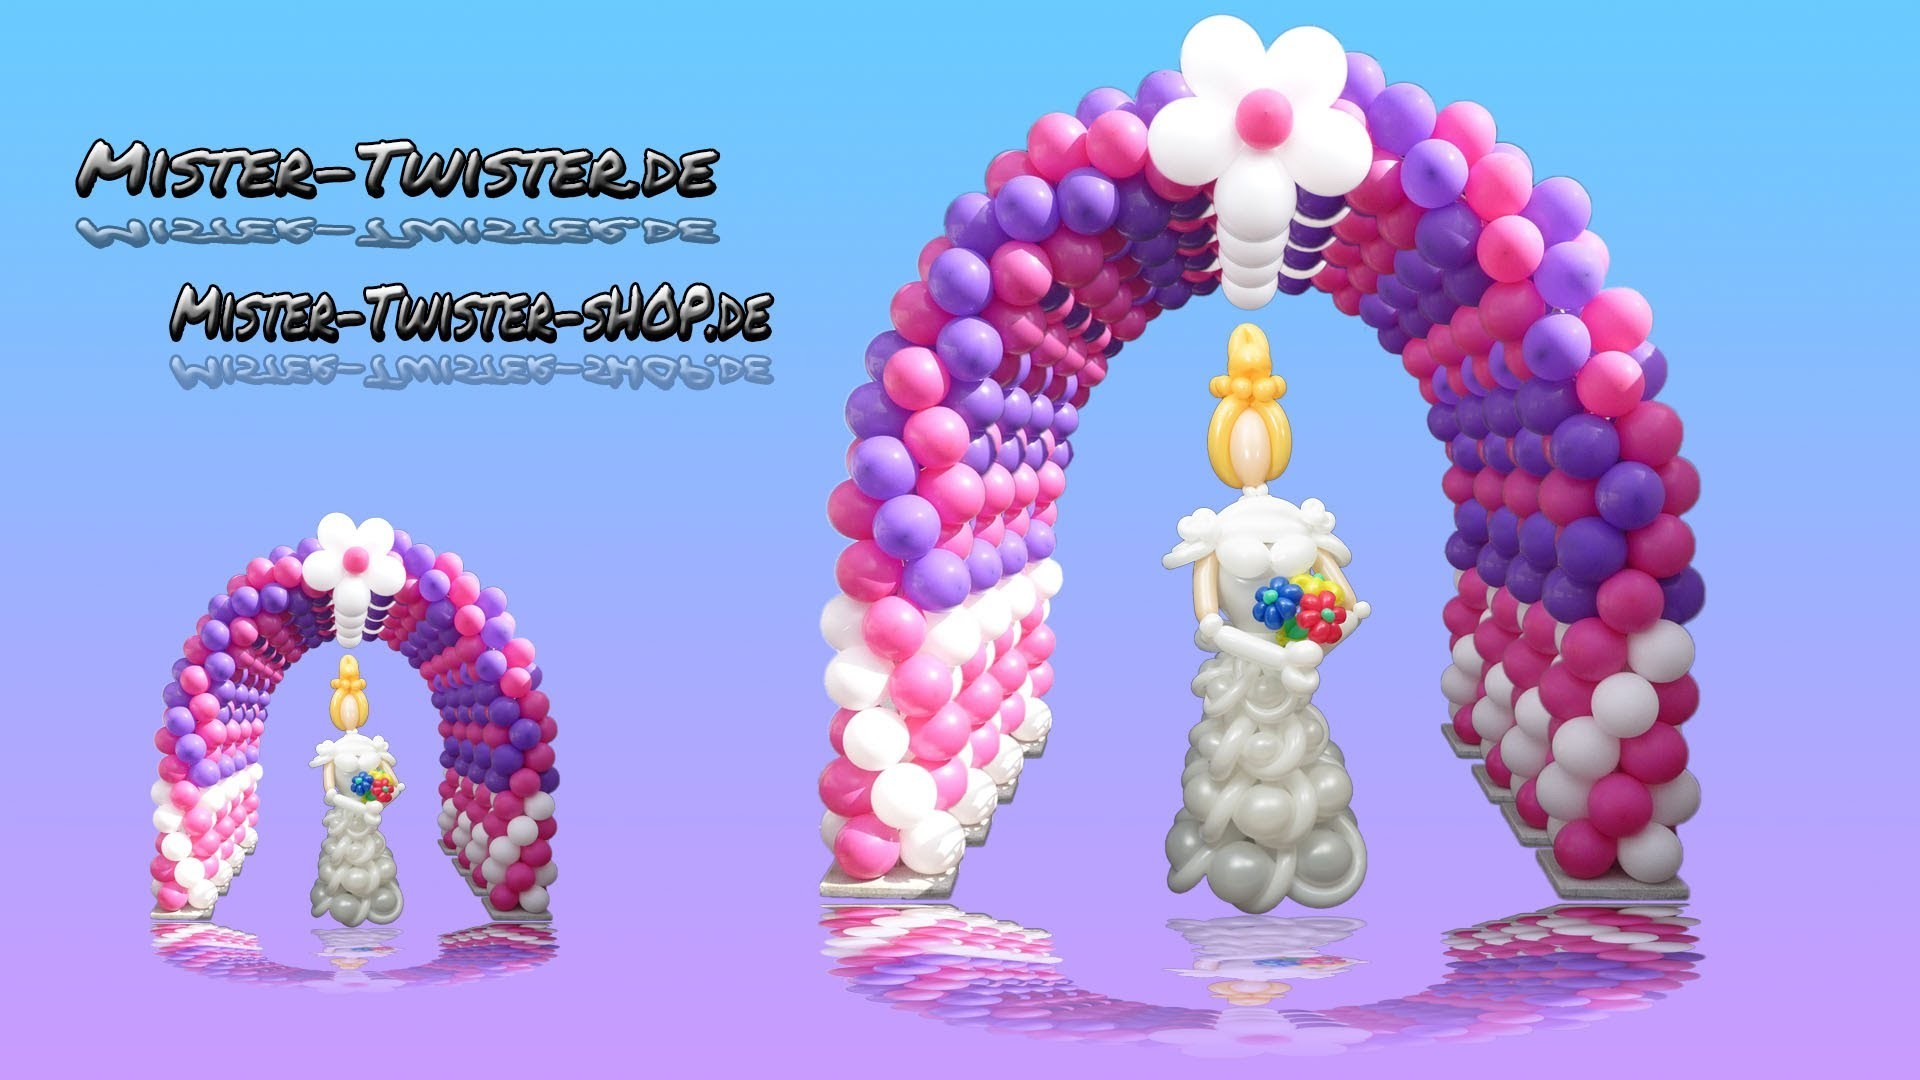 Balloon arch  decoration, Ballon Bogen Dekoration, Modellierballon Ballonfiguren